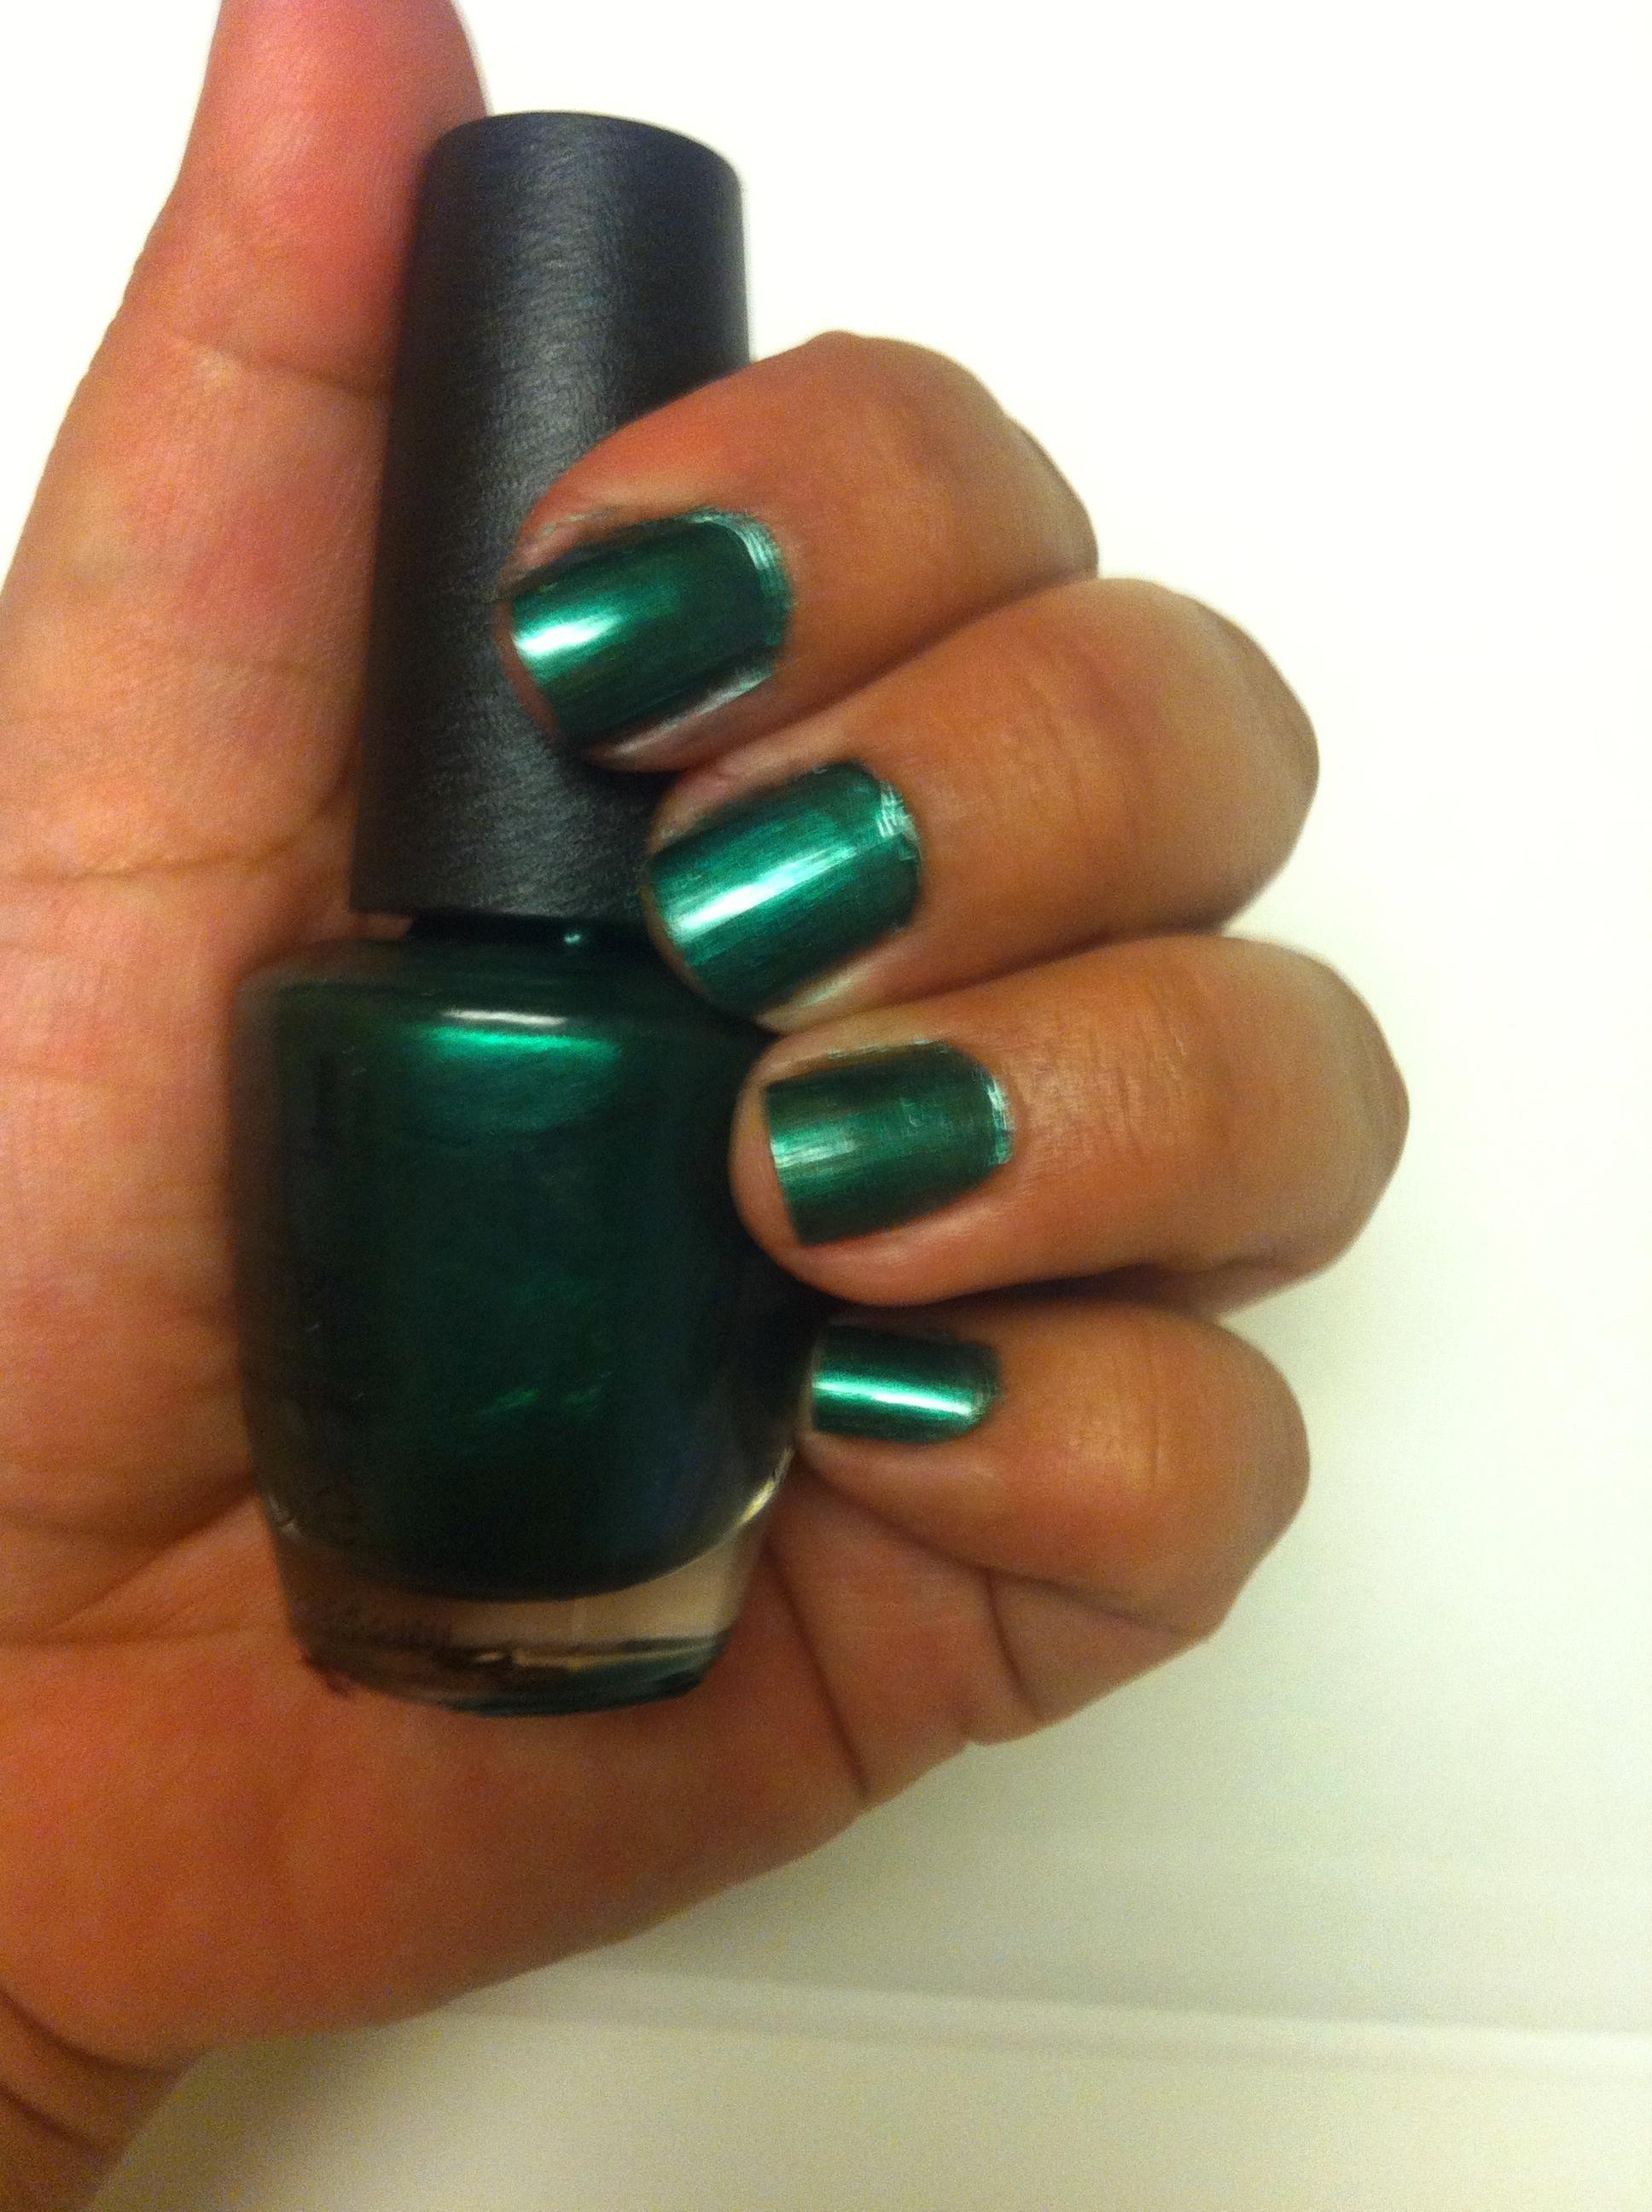 nail polish | C to C Friendspirations